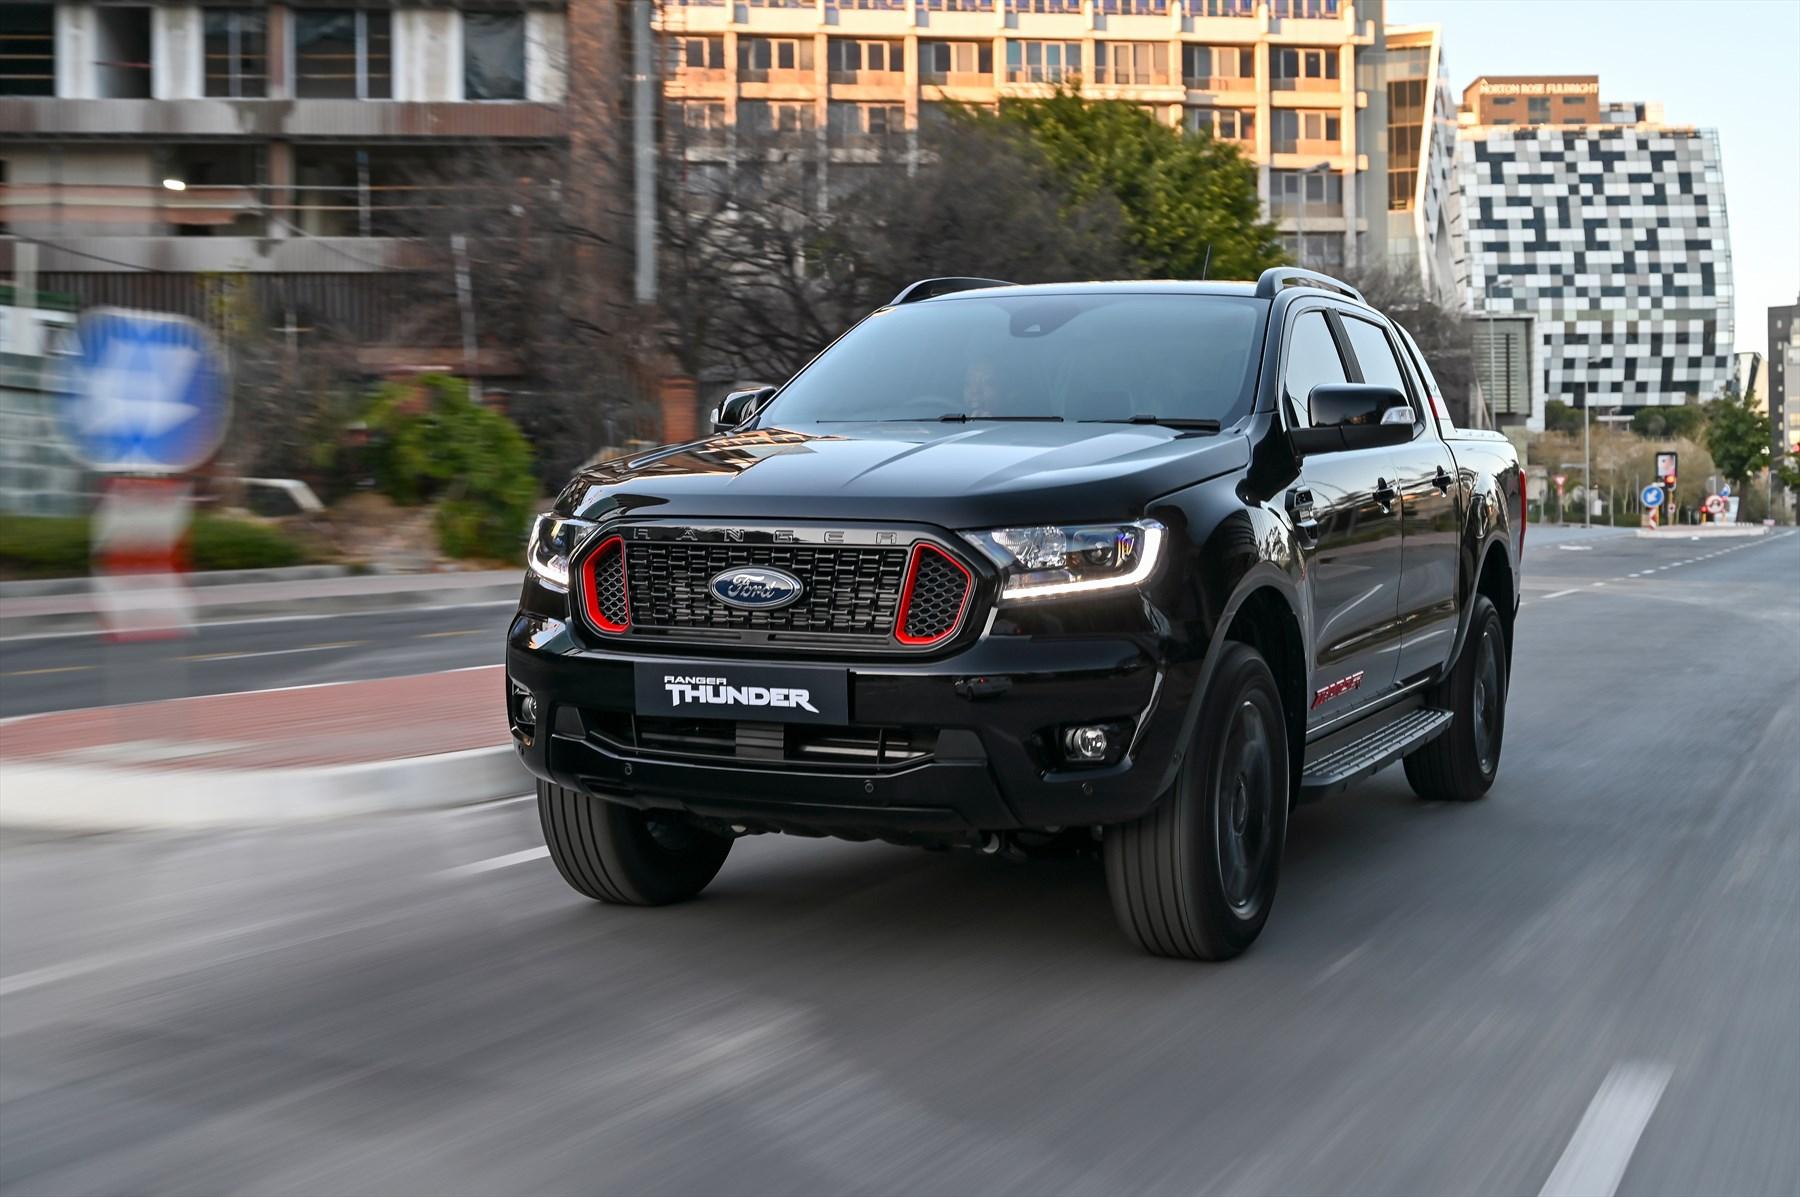 Ford Introduces Limited-Edition Ranger Thunder, Spec Upgrades on Ranger XLT, XLS